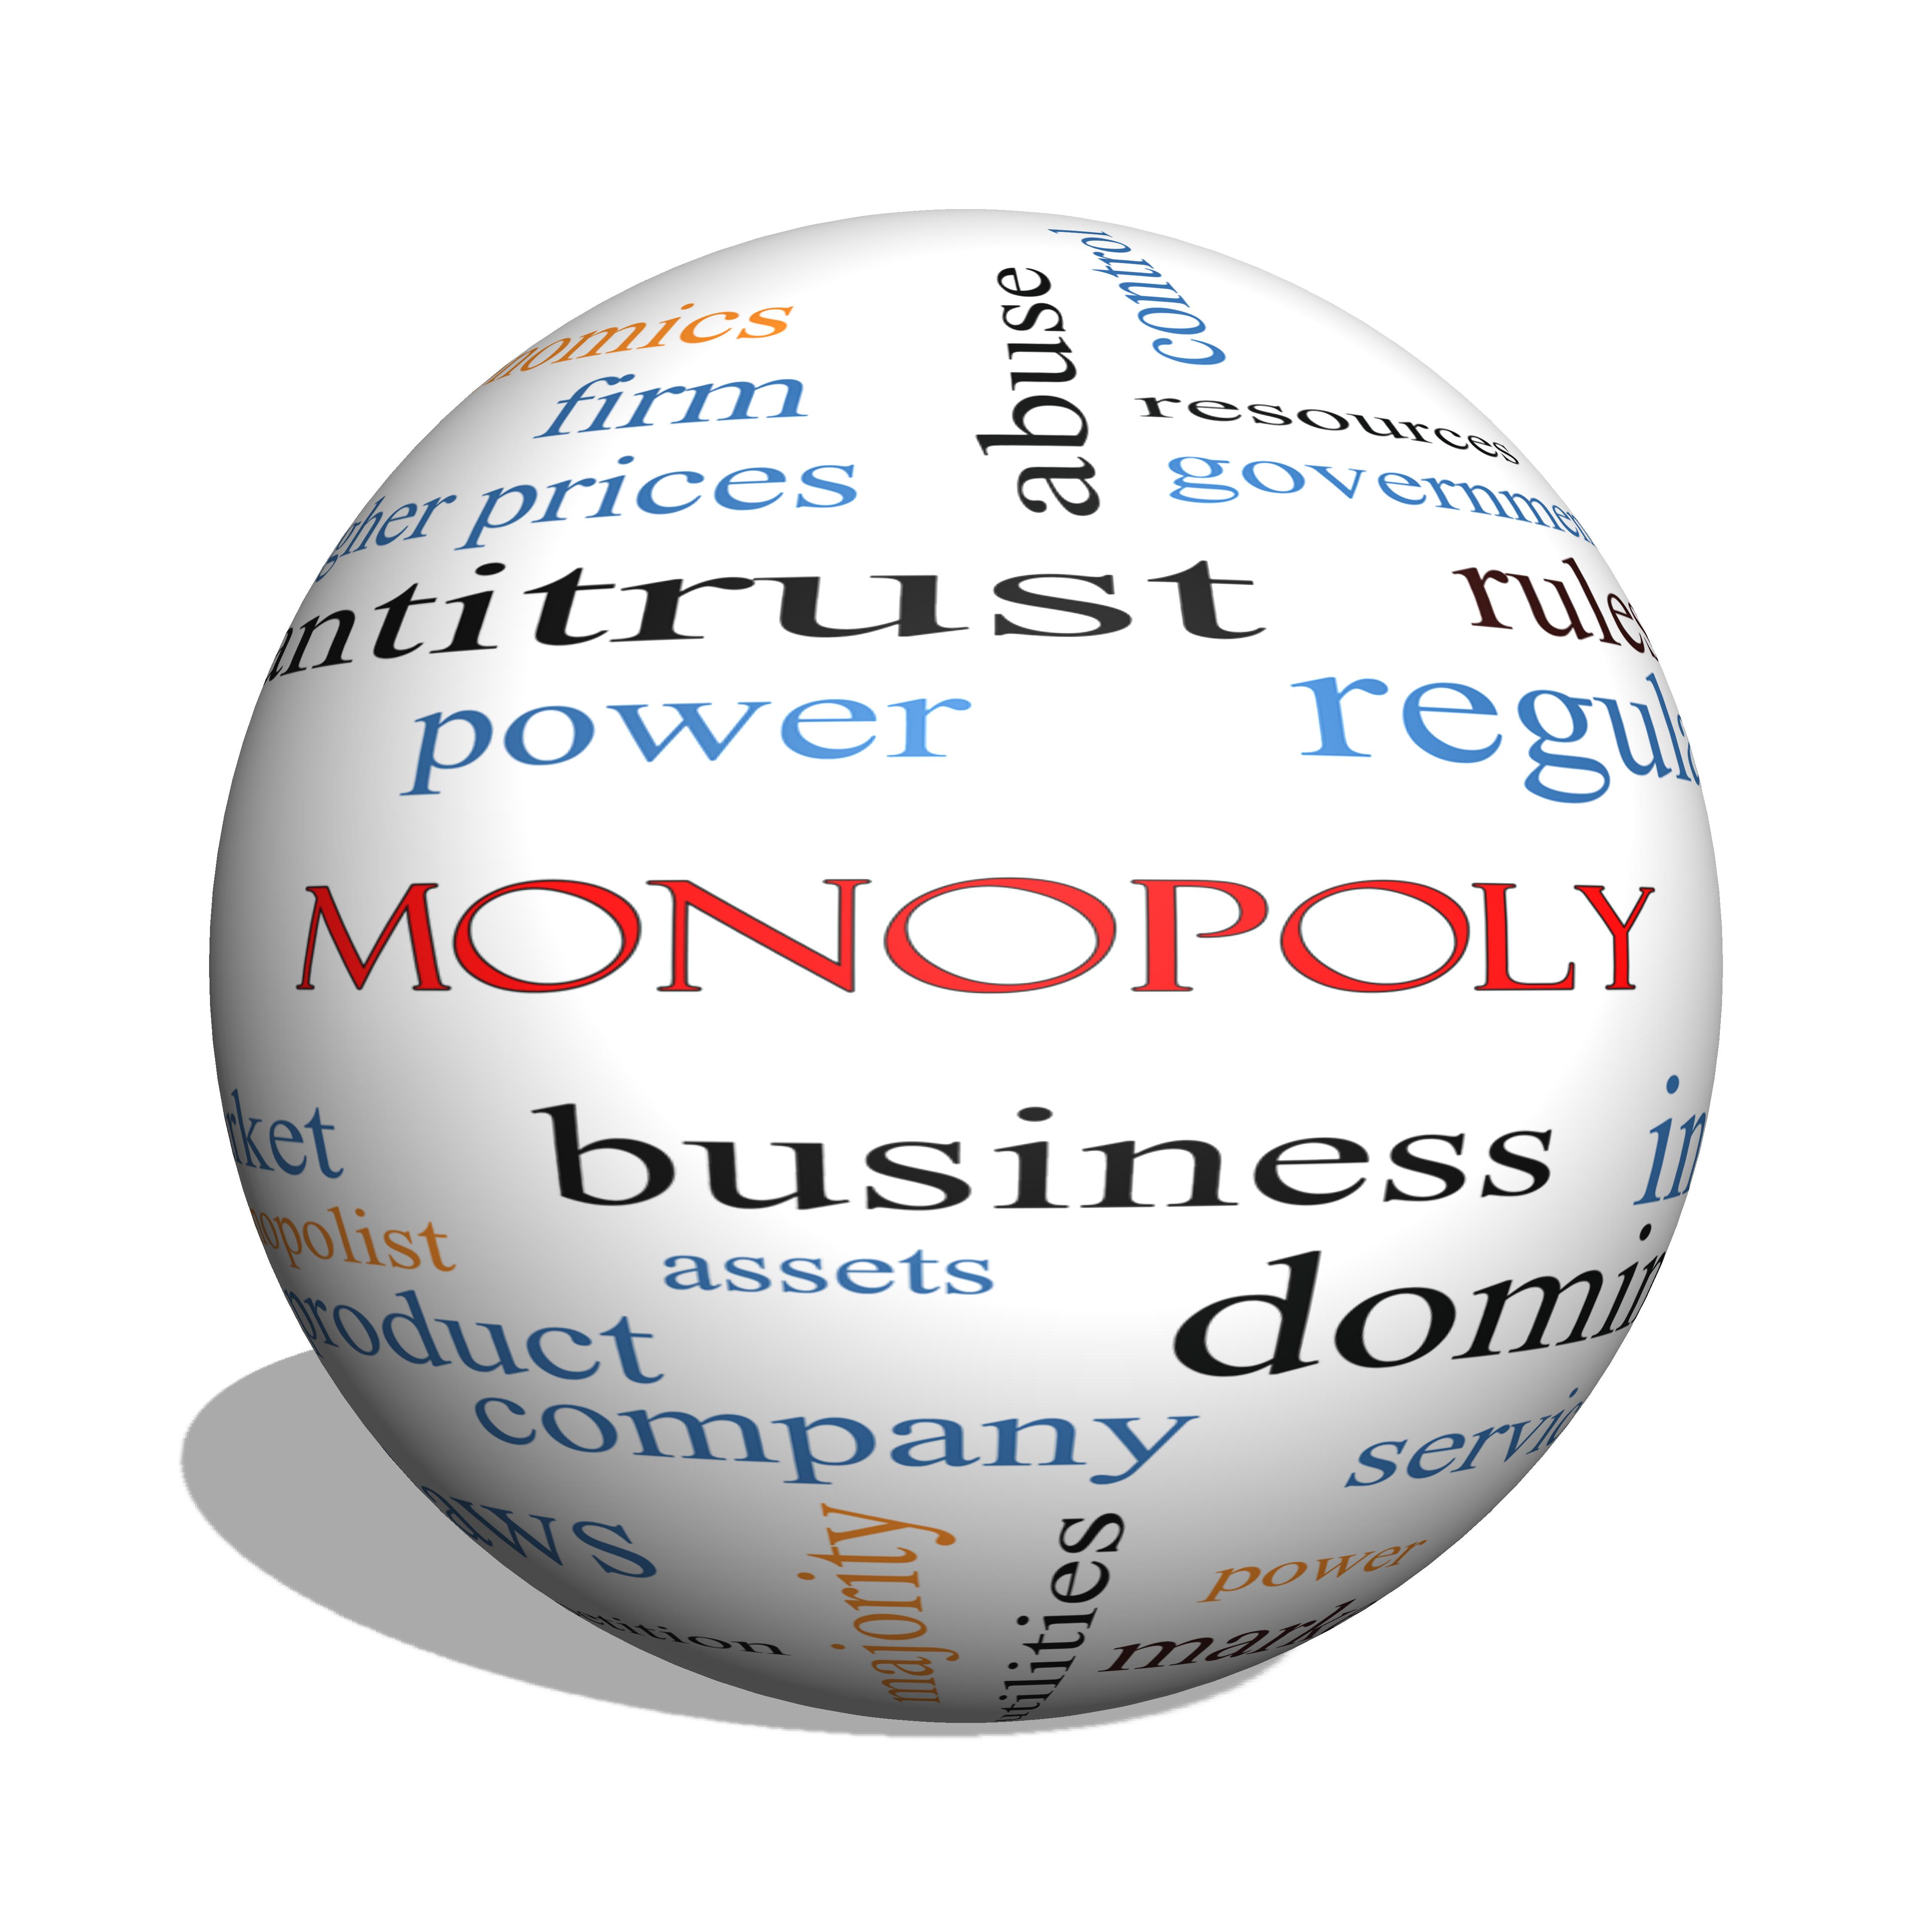 https://depositphotos.com/45057311/stock-photo-monopoly-3d-sphere-word-cloud.html